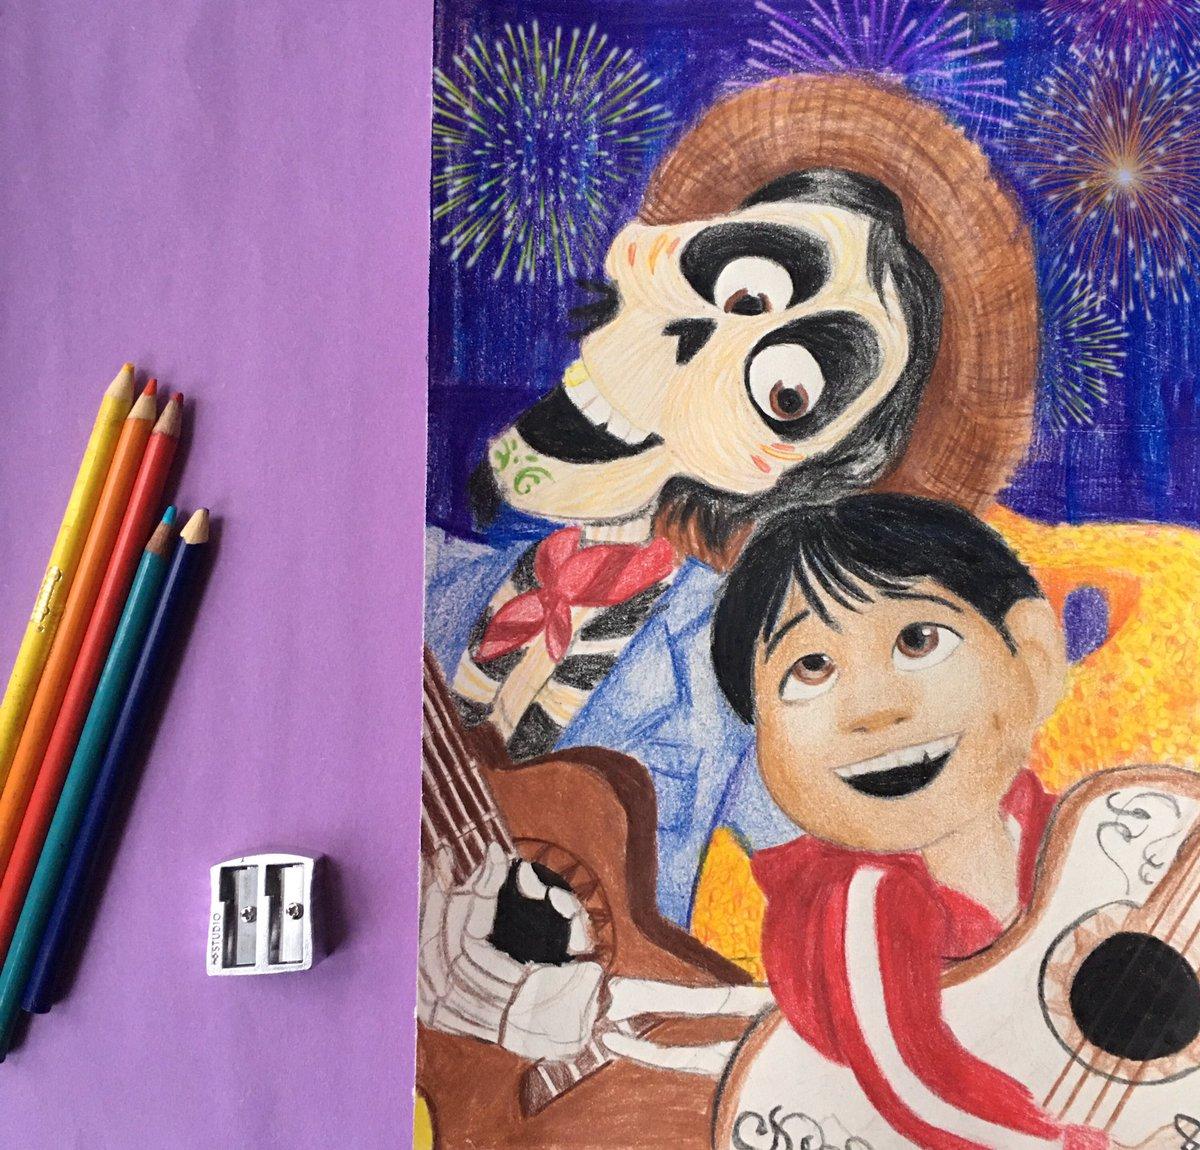 Recuérdame 🎸 #Coco #PixarCoco #pixar @Pixar #disney @Disney  #art https://t.co/2pt3j2BB8q